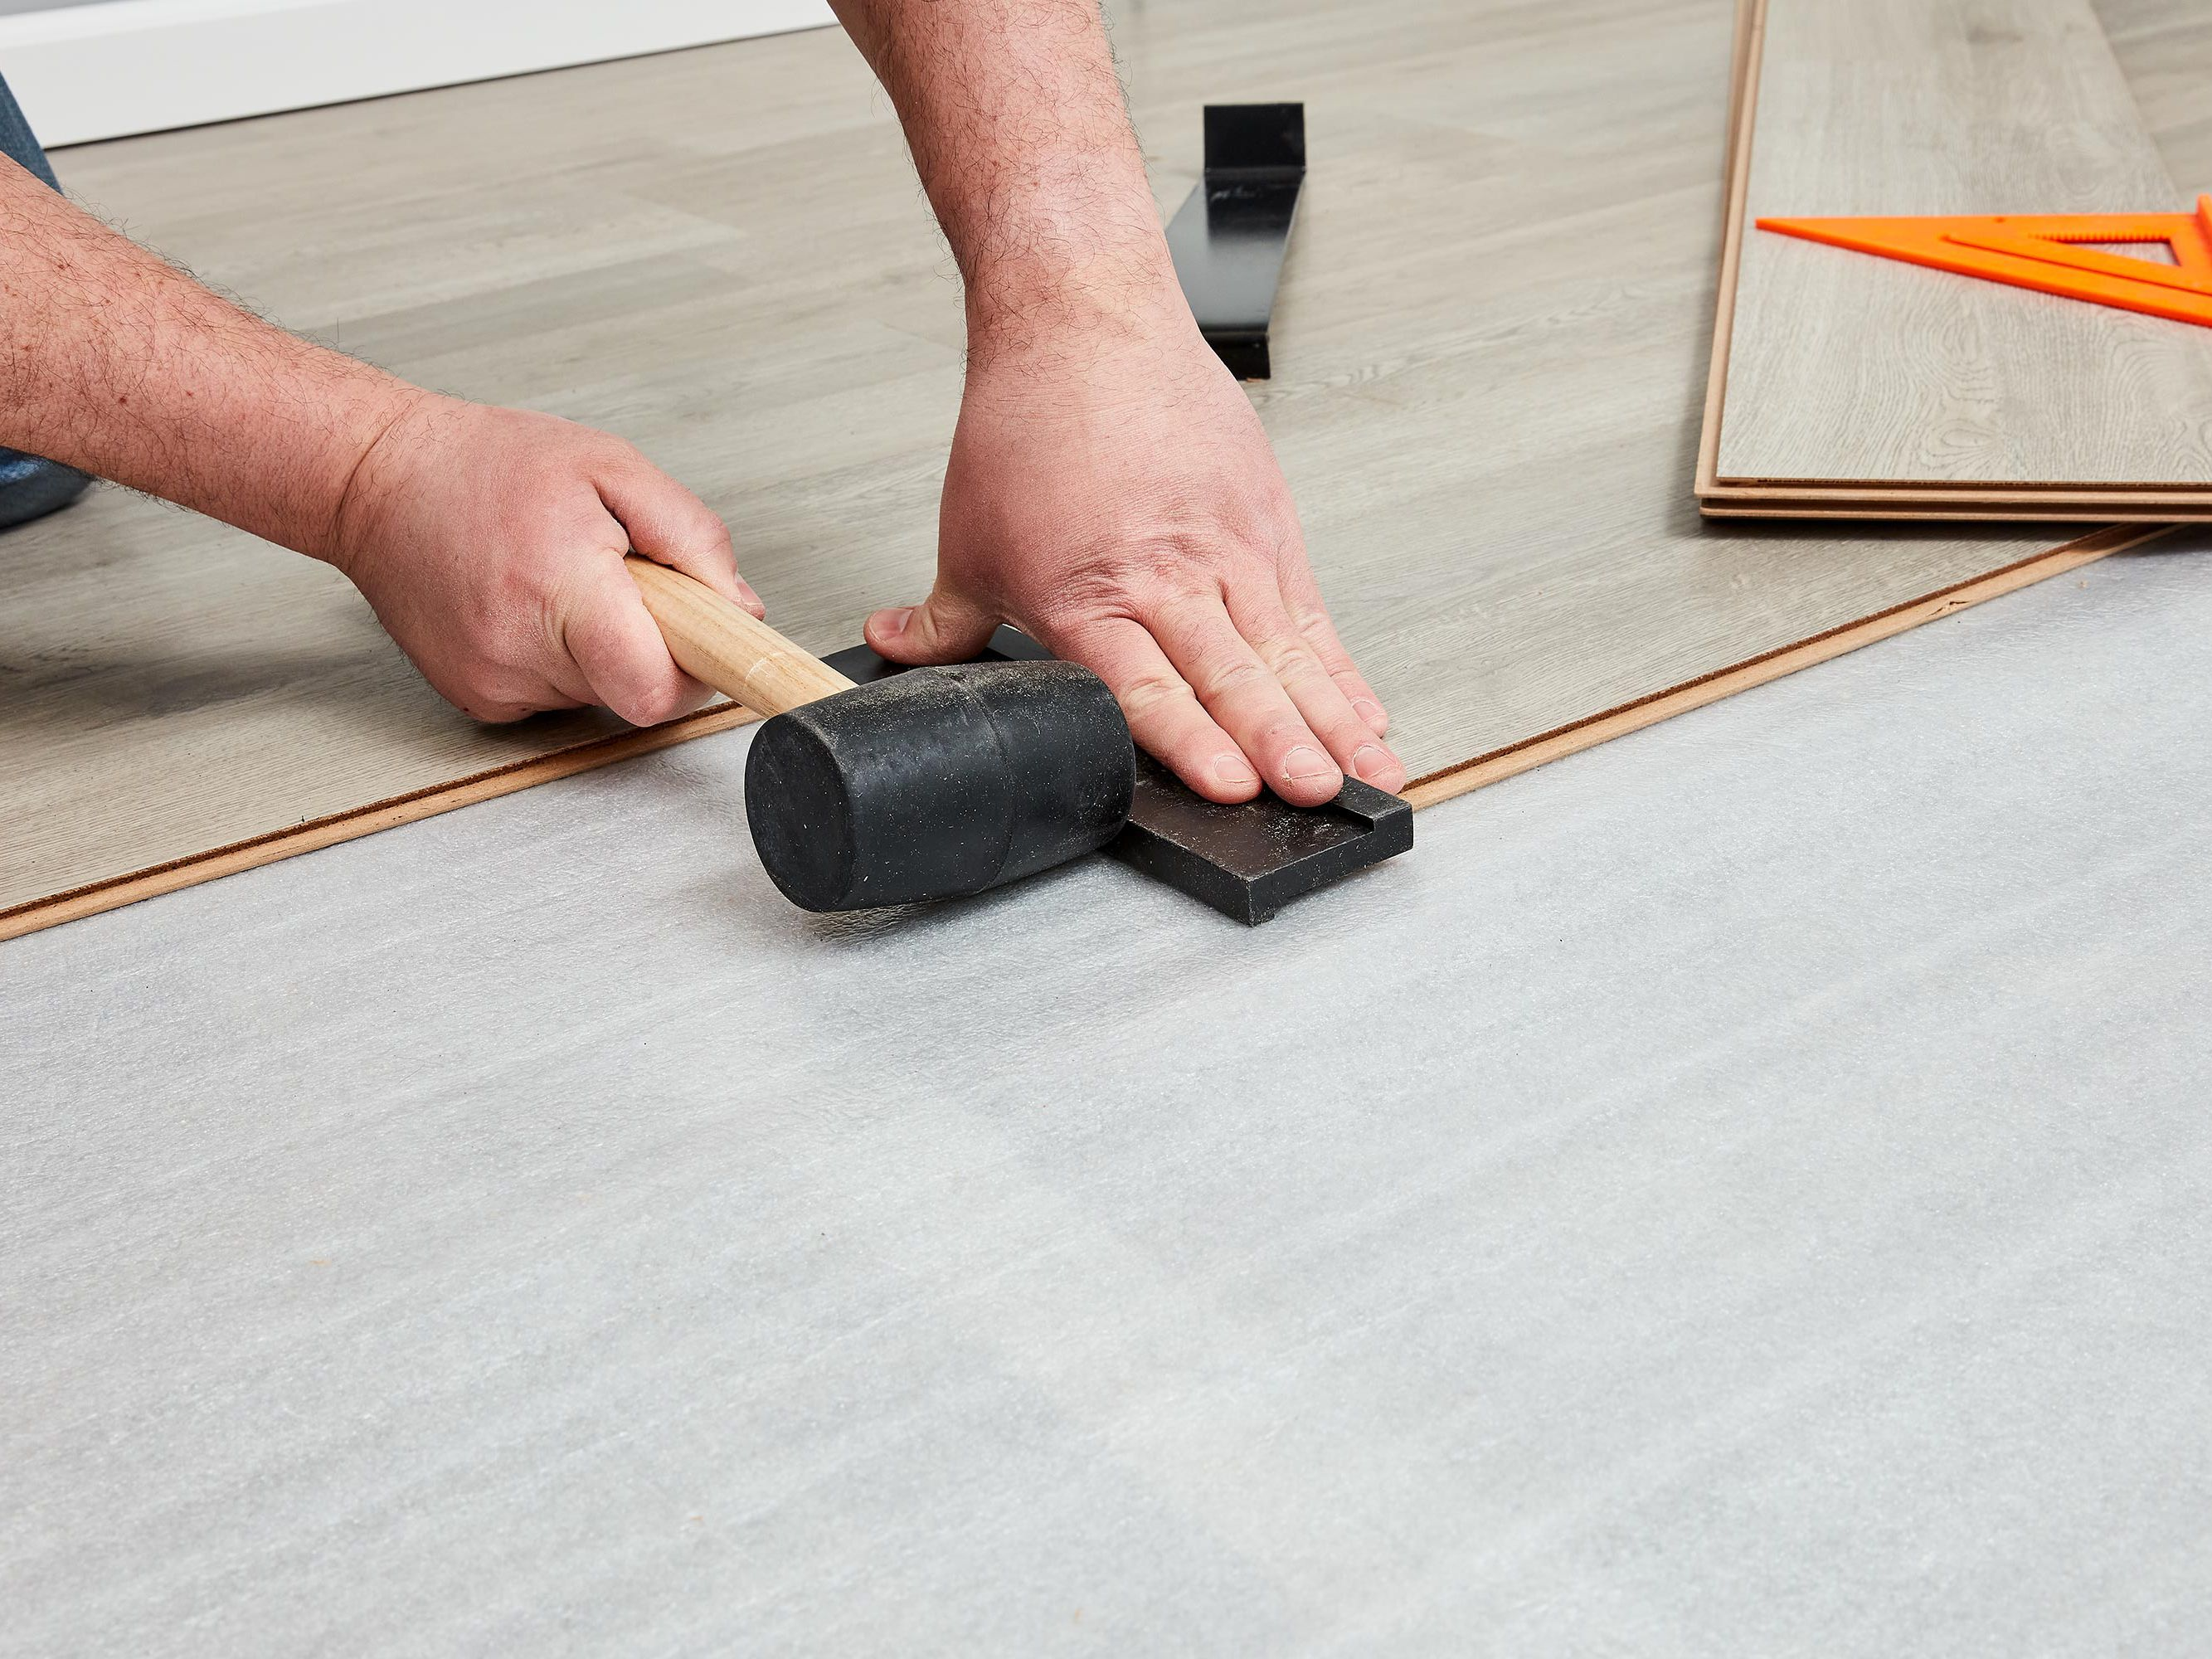 Best Underlayment For Laminate Flooring, What Do You Lay Under Laminate Flooring